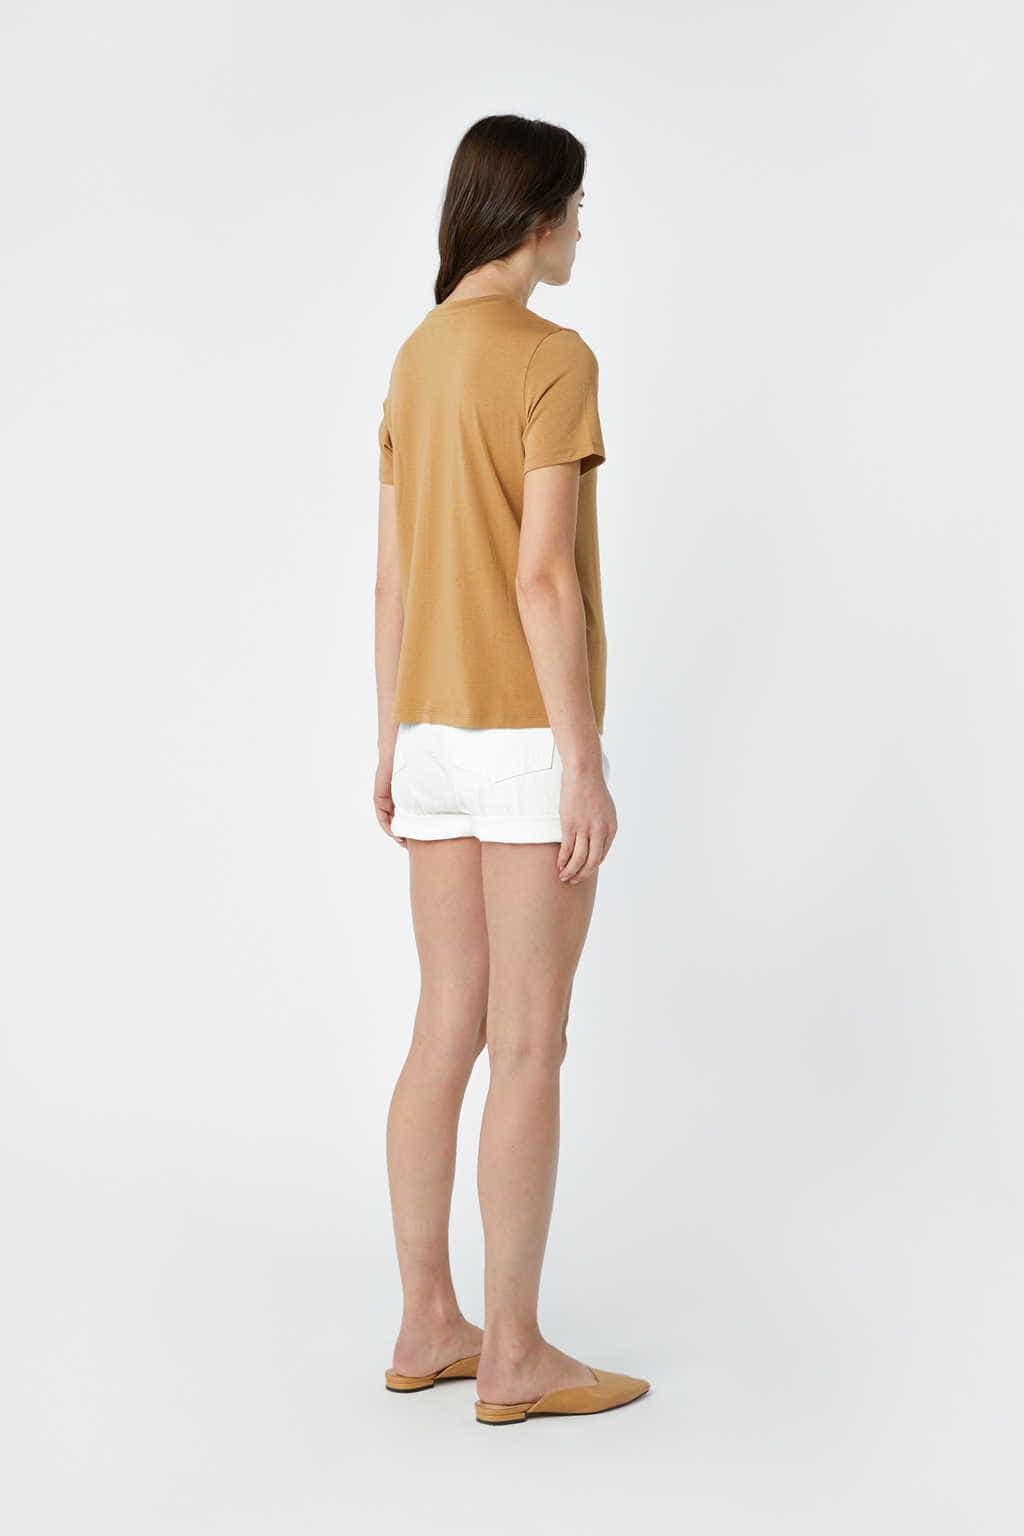 TShirt 3343 Camel 4